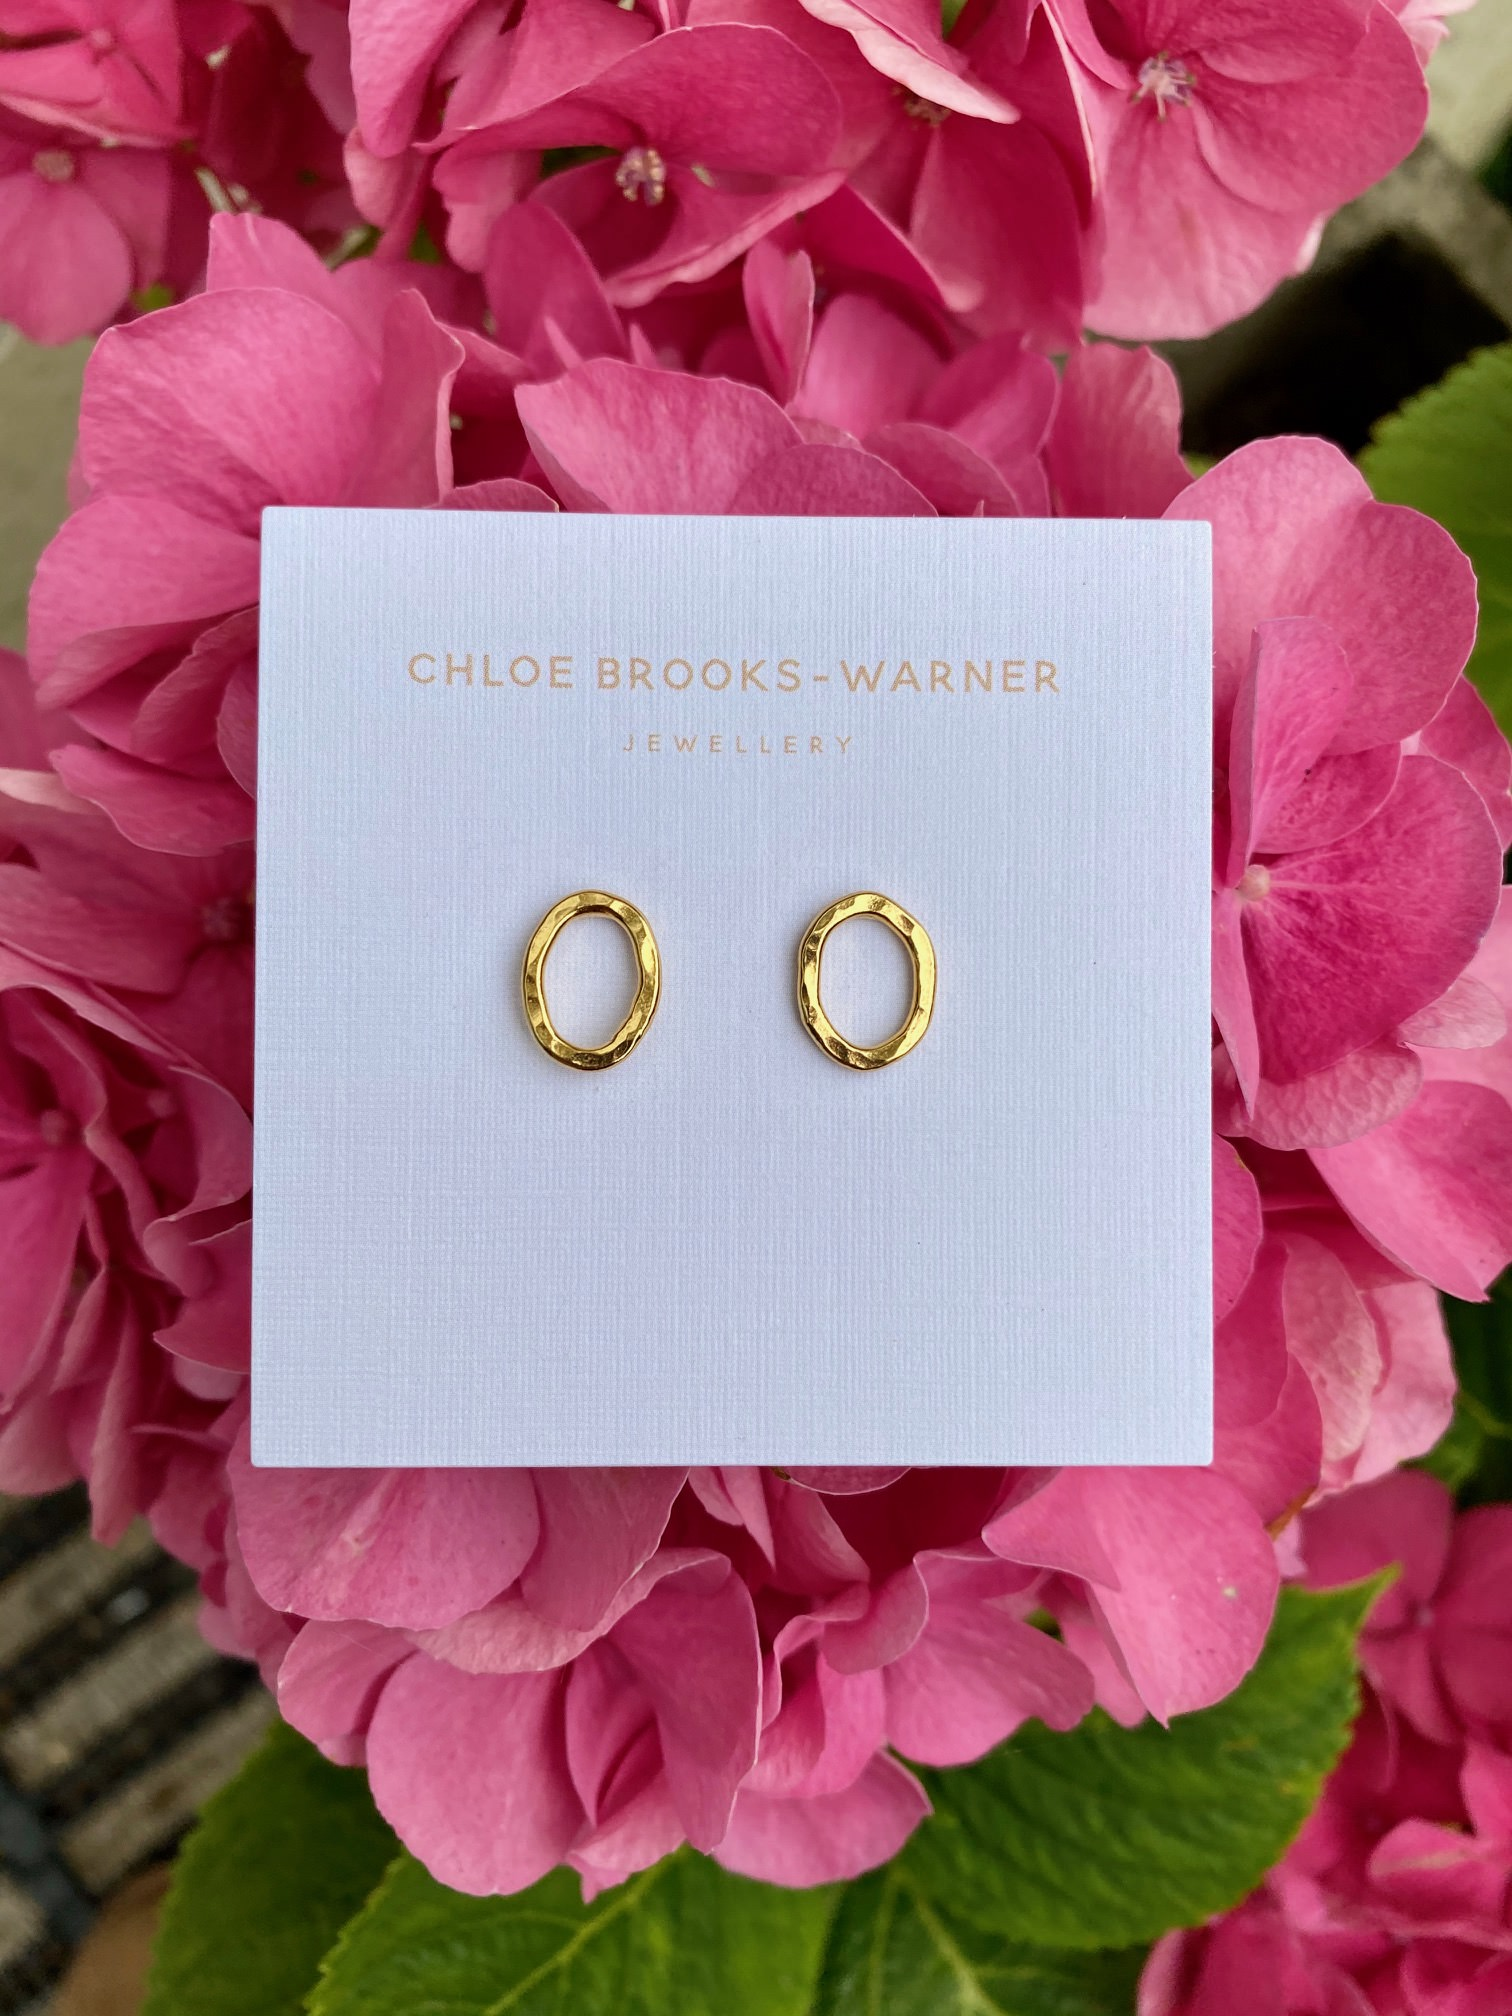 Mini crooked studs gold handmade by jeweller Chloe Brooks Warner